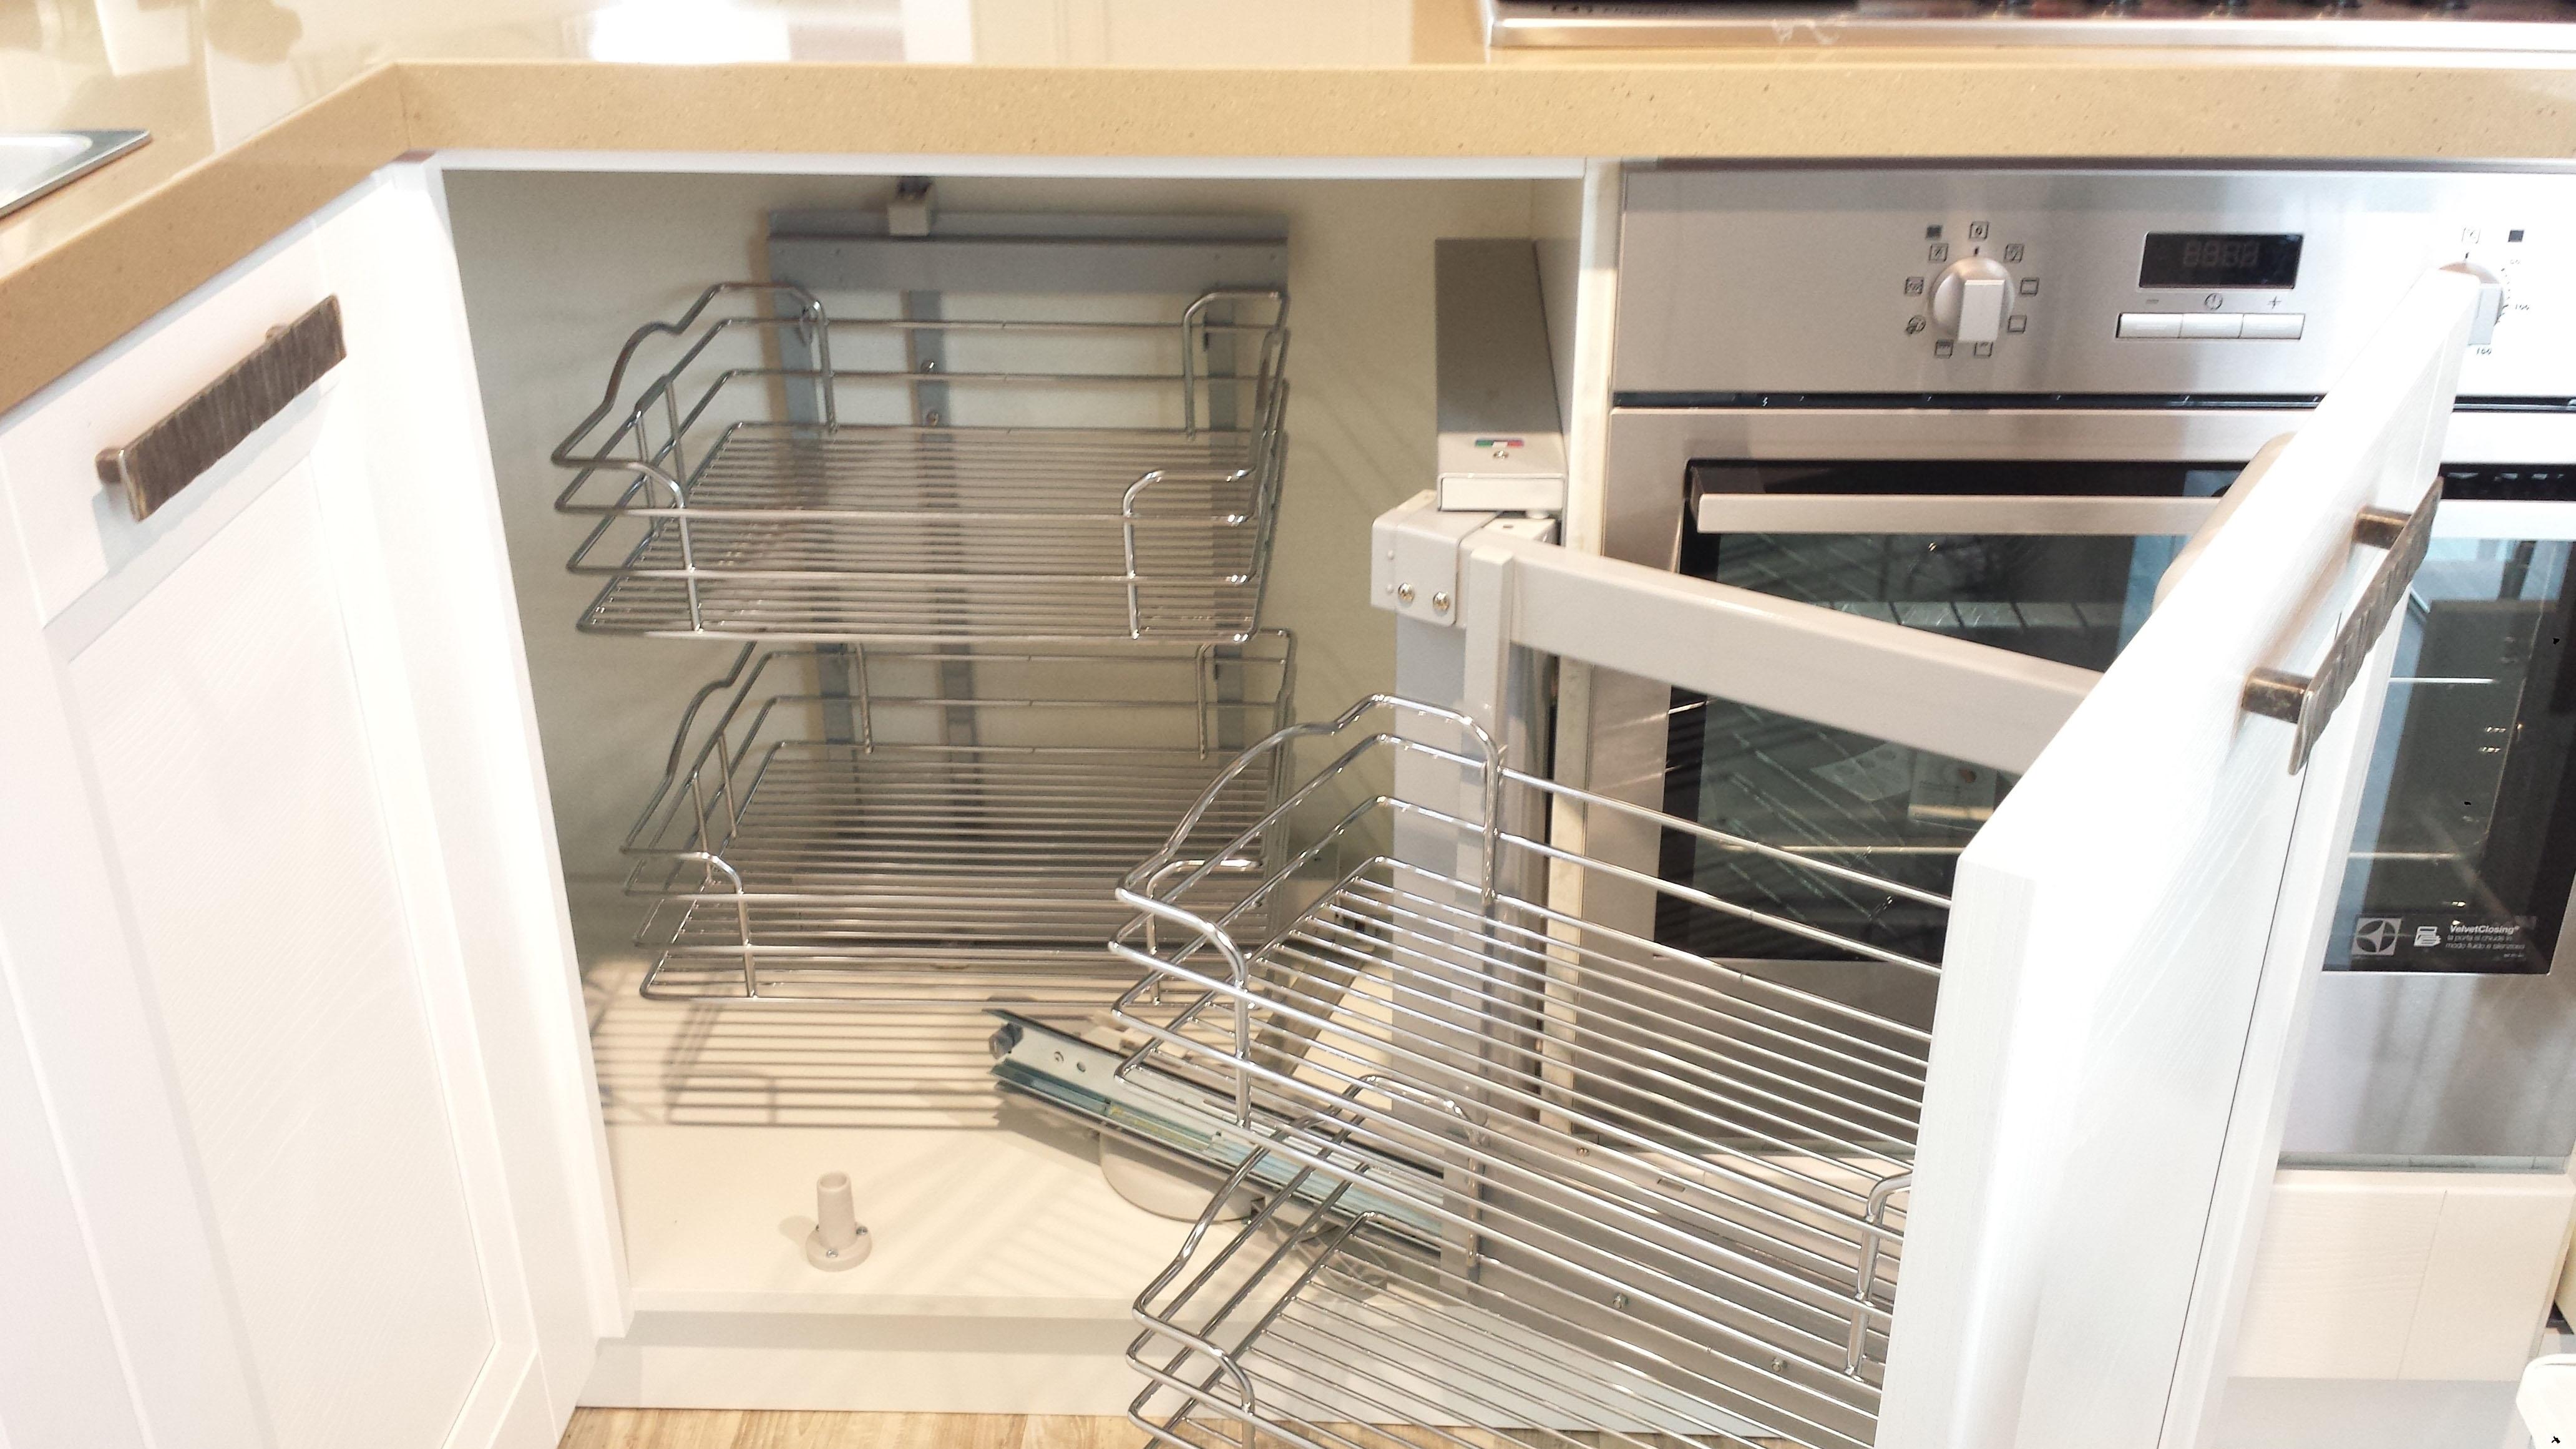 Cucina stosa mod beverly completa di elettrodomestici 20240 cucine a prezzi scontati - Cucina beverly stosa prezzi ...